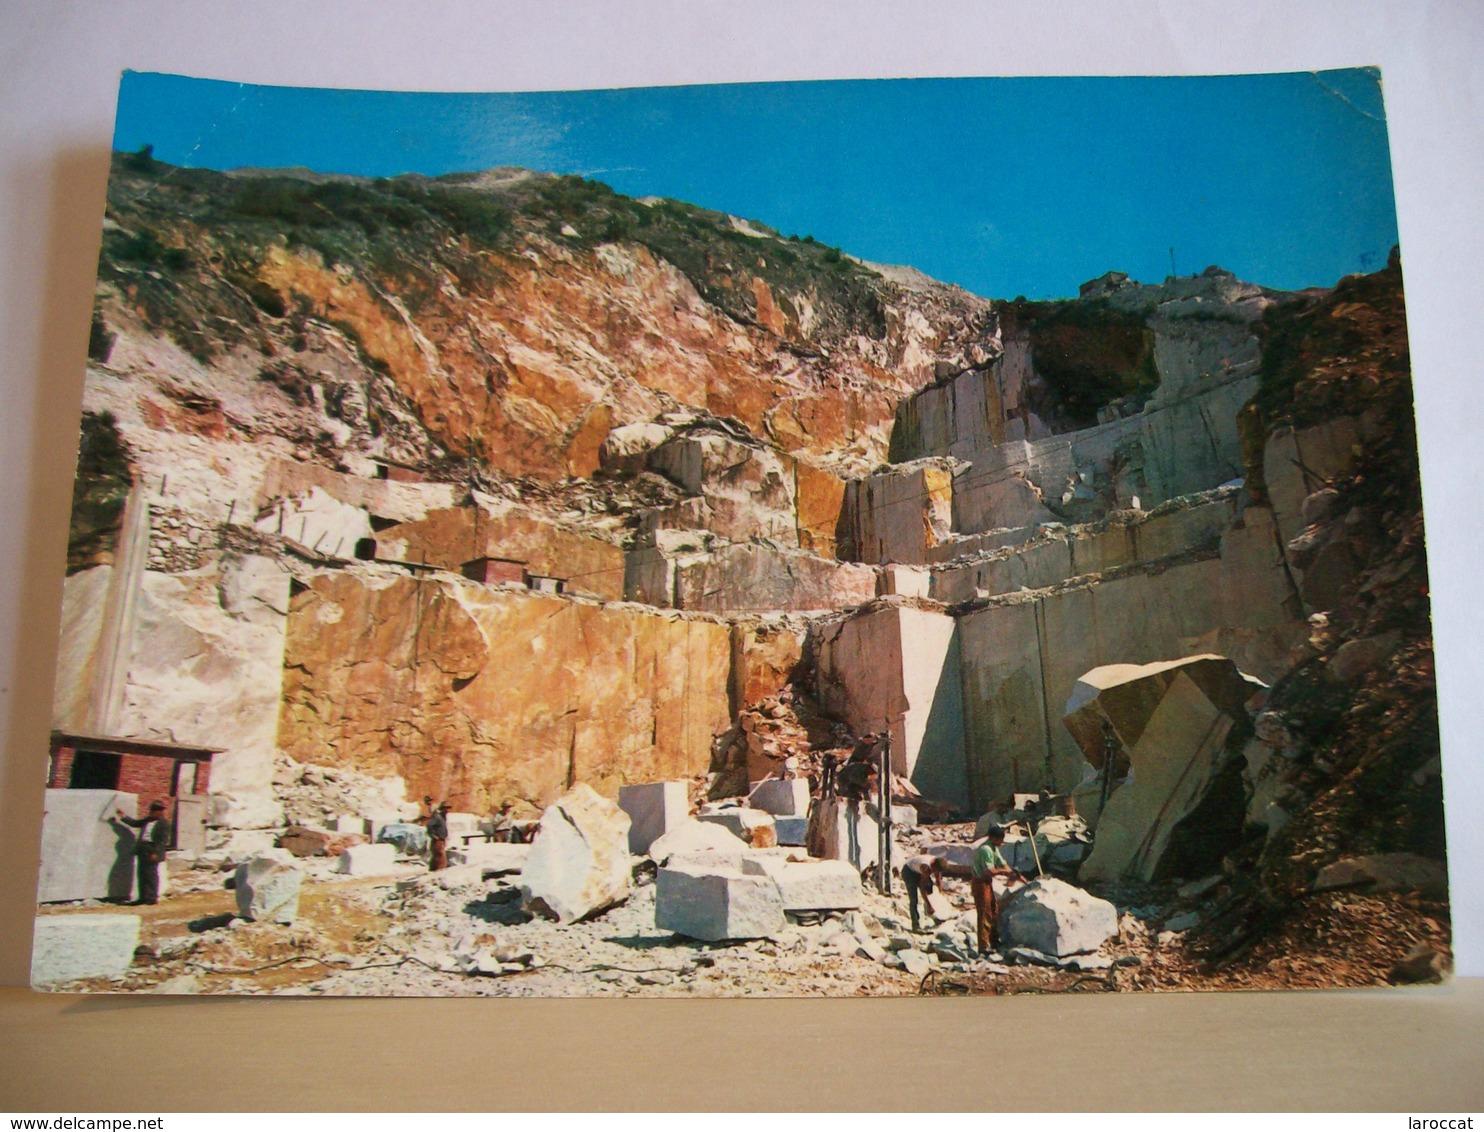 1962 - Carrara -  Cava Di Marmo - Cave - Alpi Apuane - Carrara